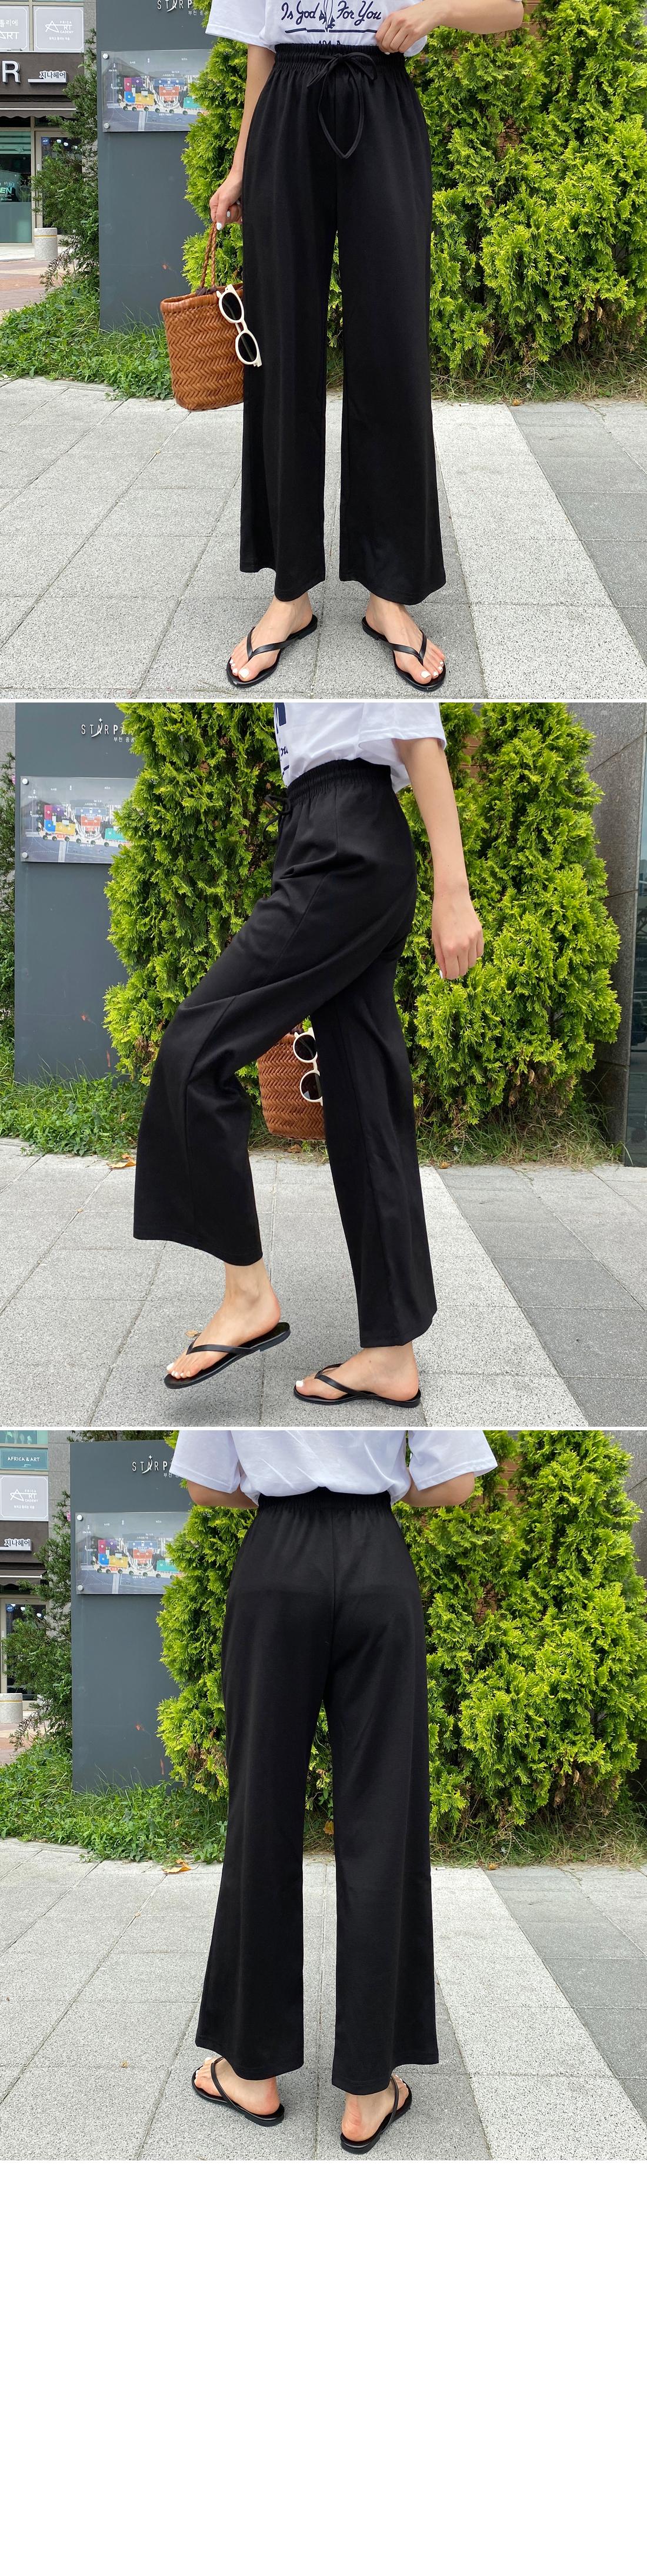 Cool banding wide pants